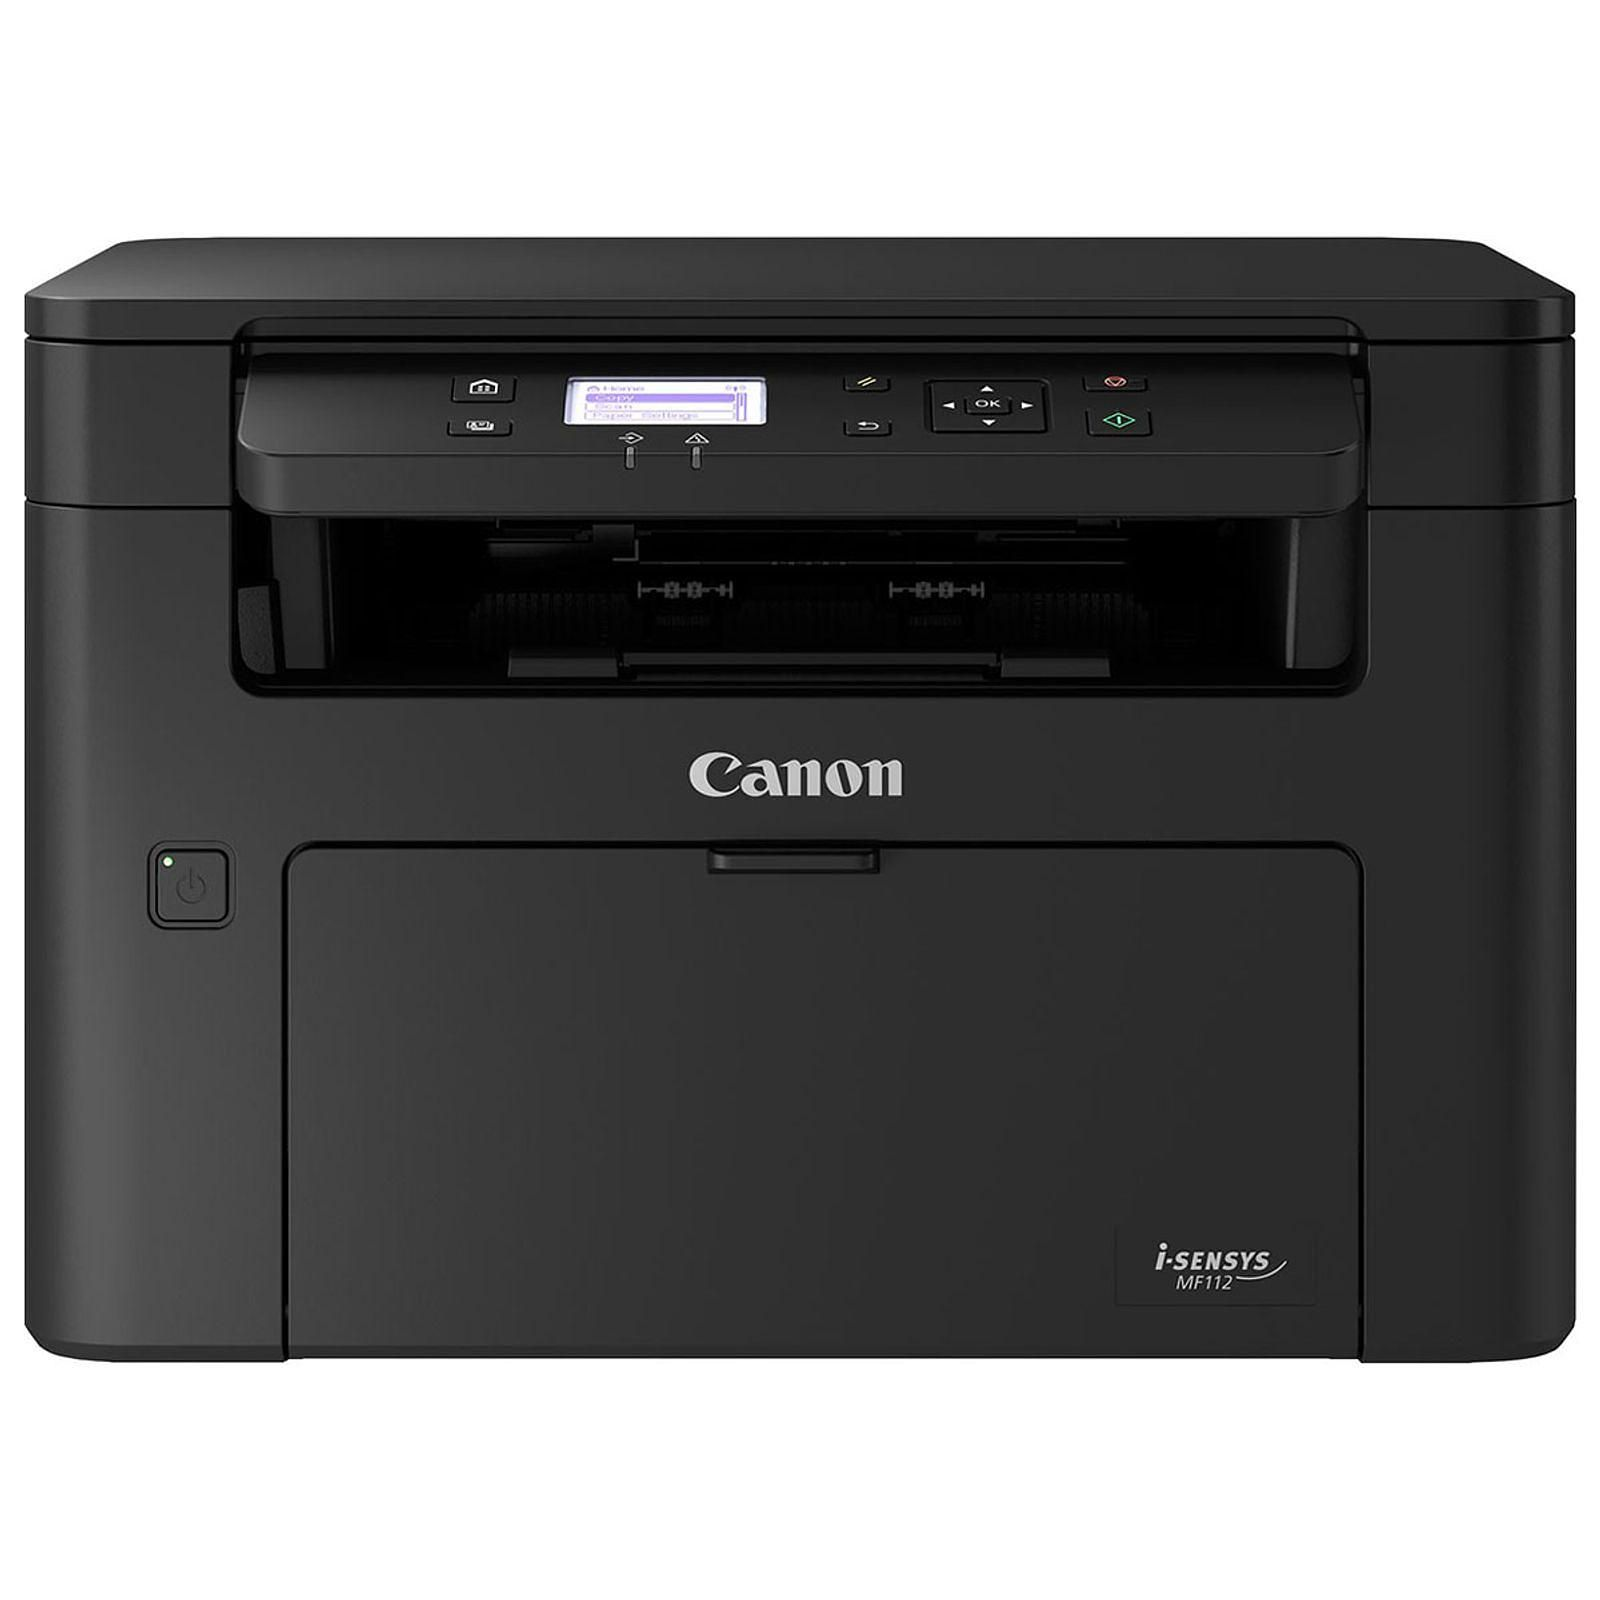 Imprimante multifonction Canon i-SENSYS MF112 - Cybertek.fr - 0